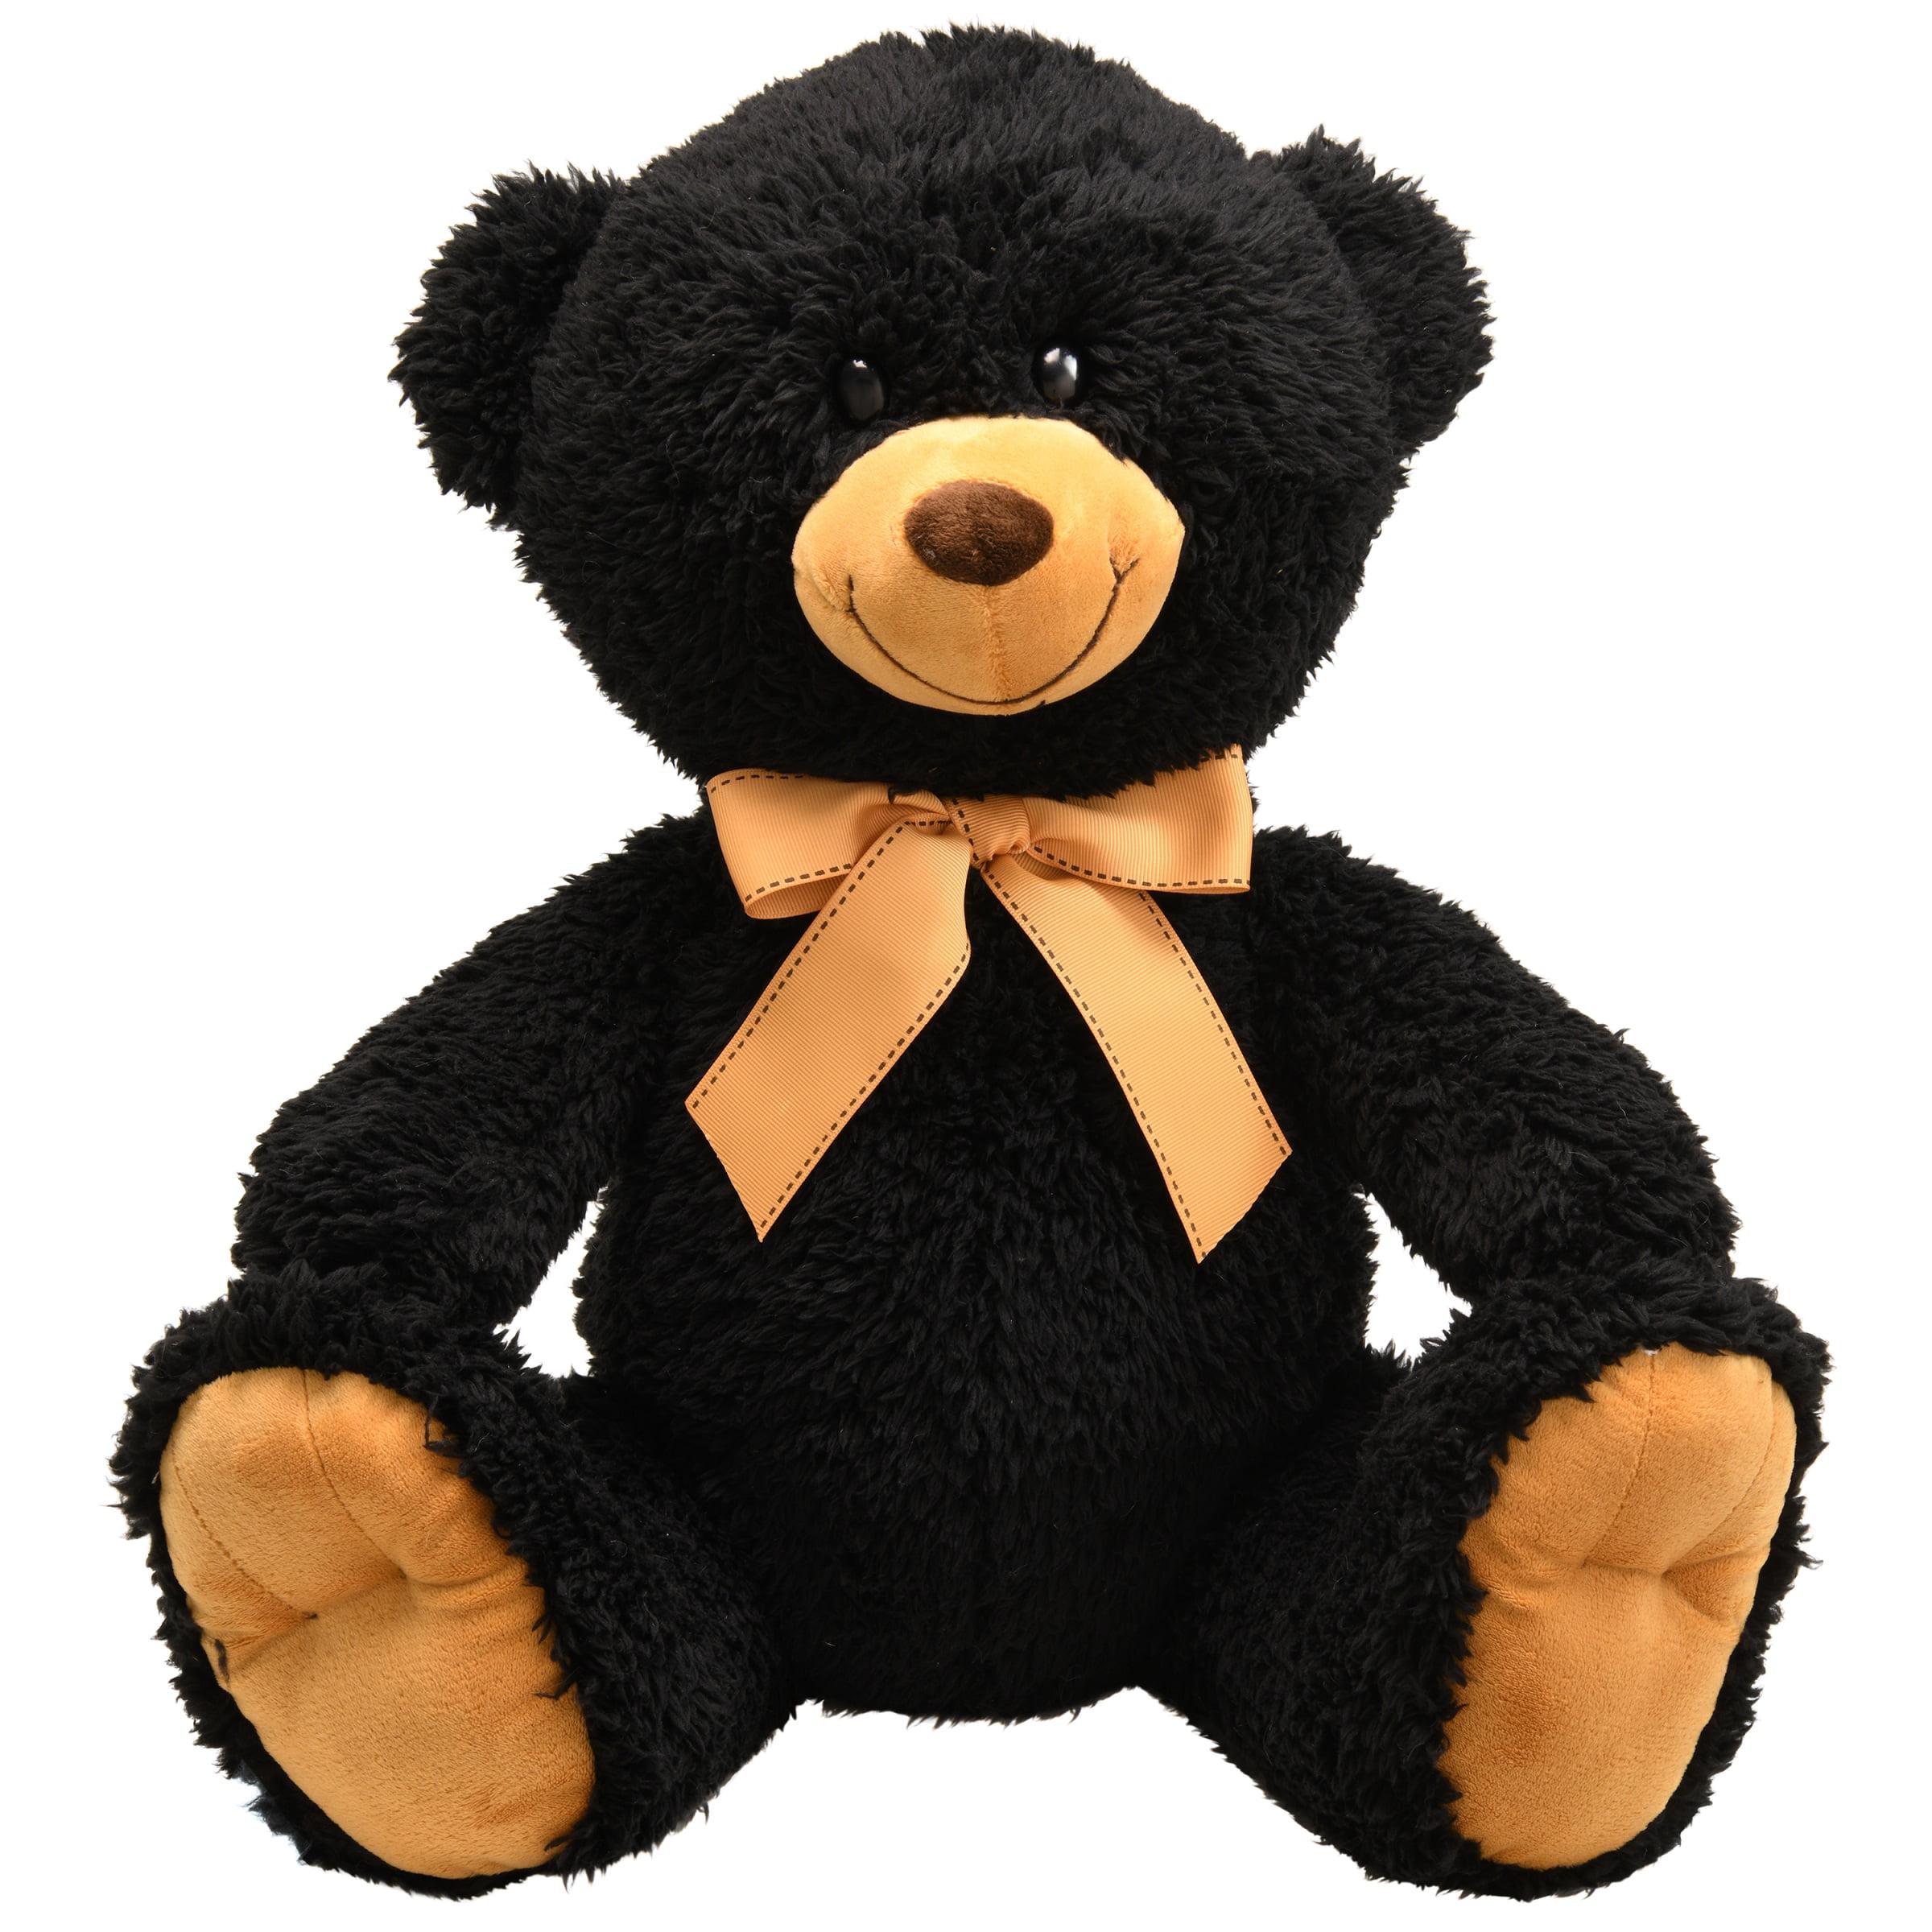 Spark Create Imagine Plush Large Teddy Bear Black Walmart Com